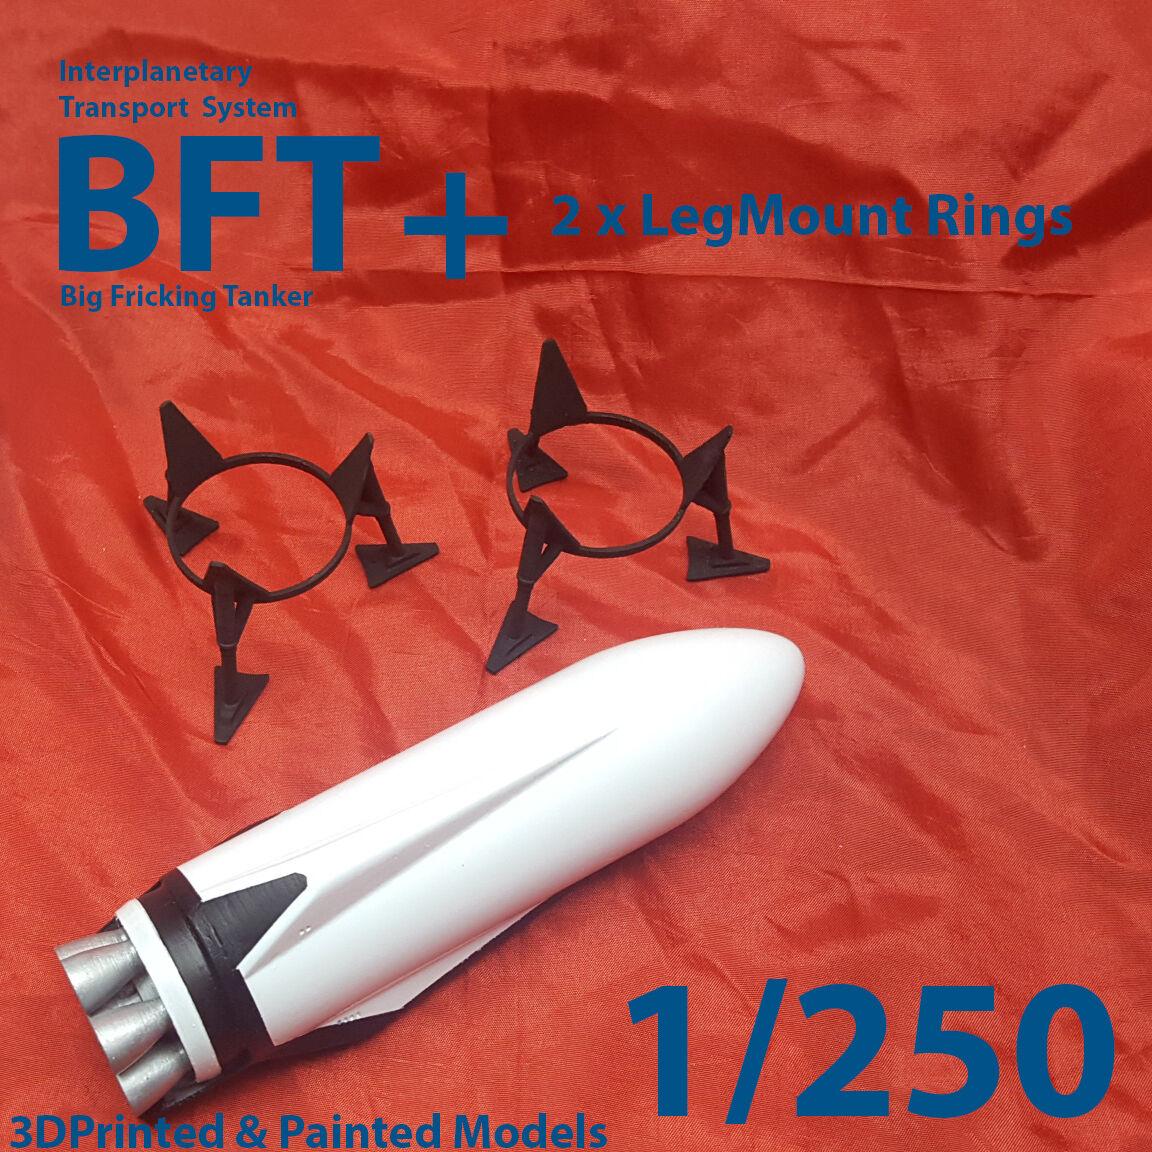 ITS BFT (Tanker) Set - 3Dprinted & Painted Models